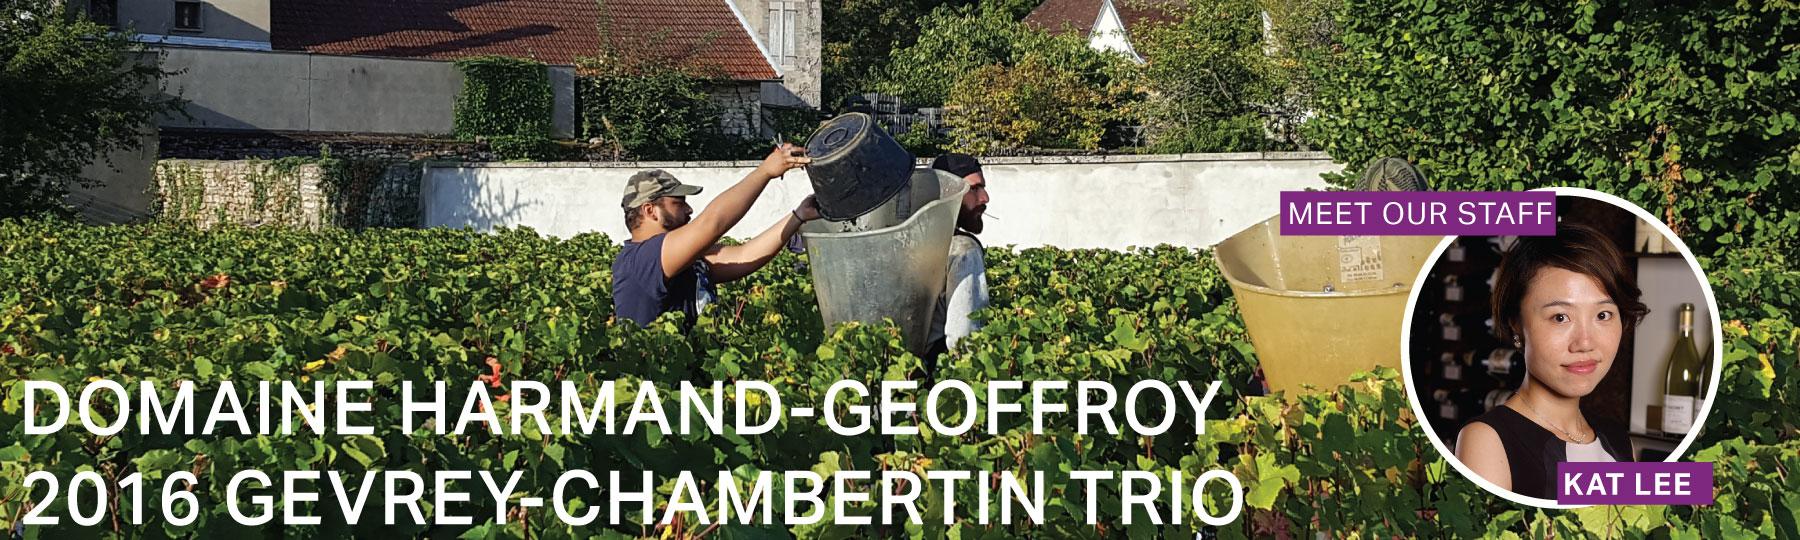 Fine Wine Friday: Domaine Harmand-Geoffroy 2016 Gevrey-Chambertin Trio